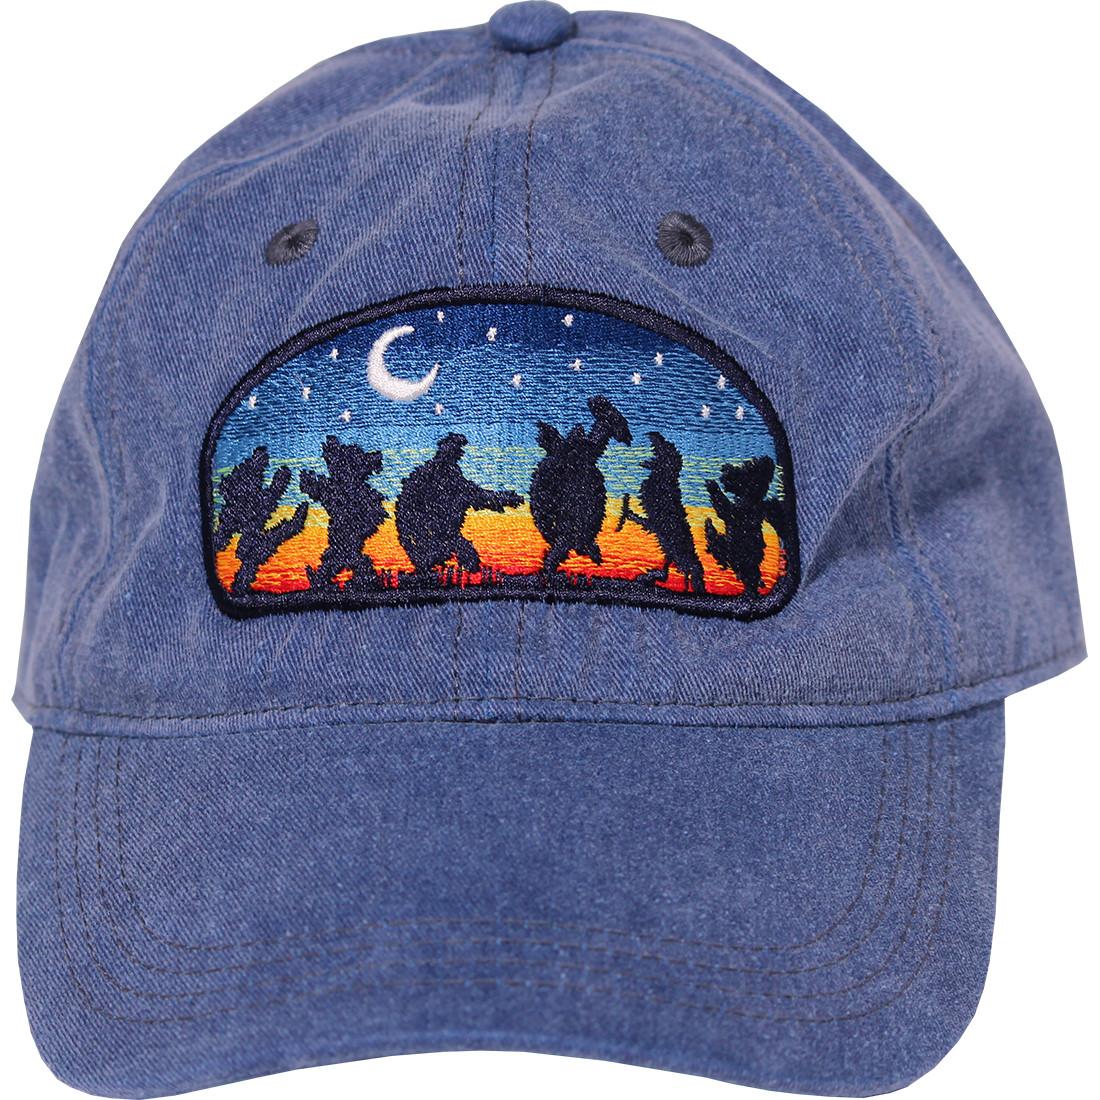 GD Moondance Denim Baseball Cap